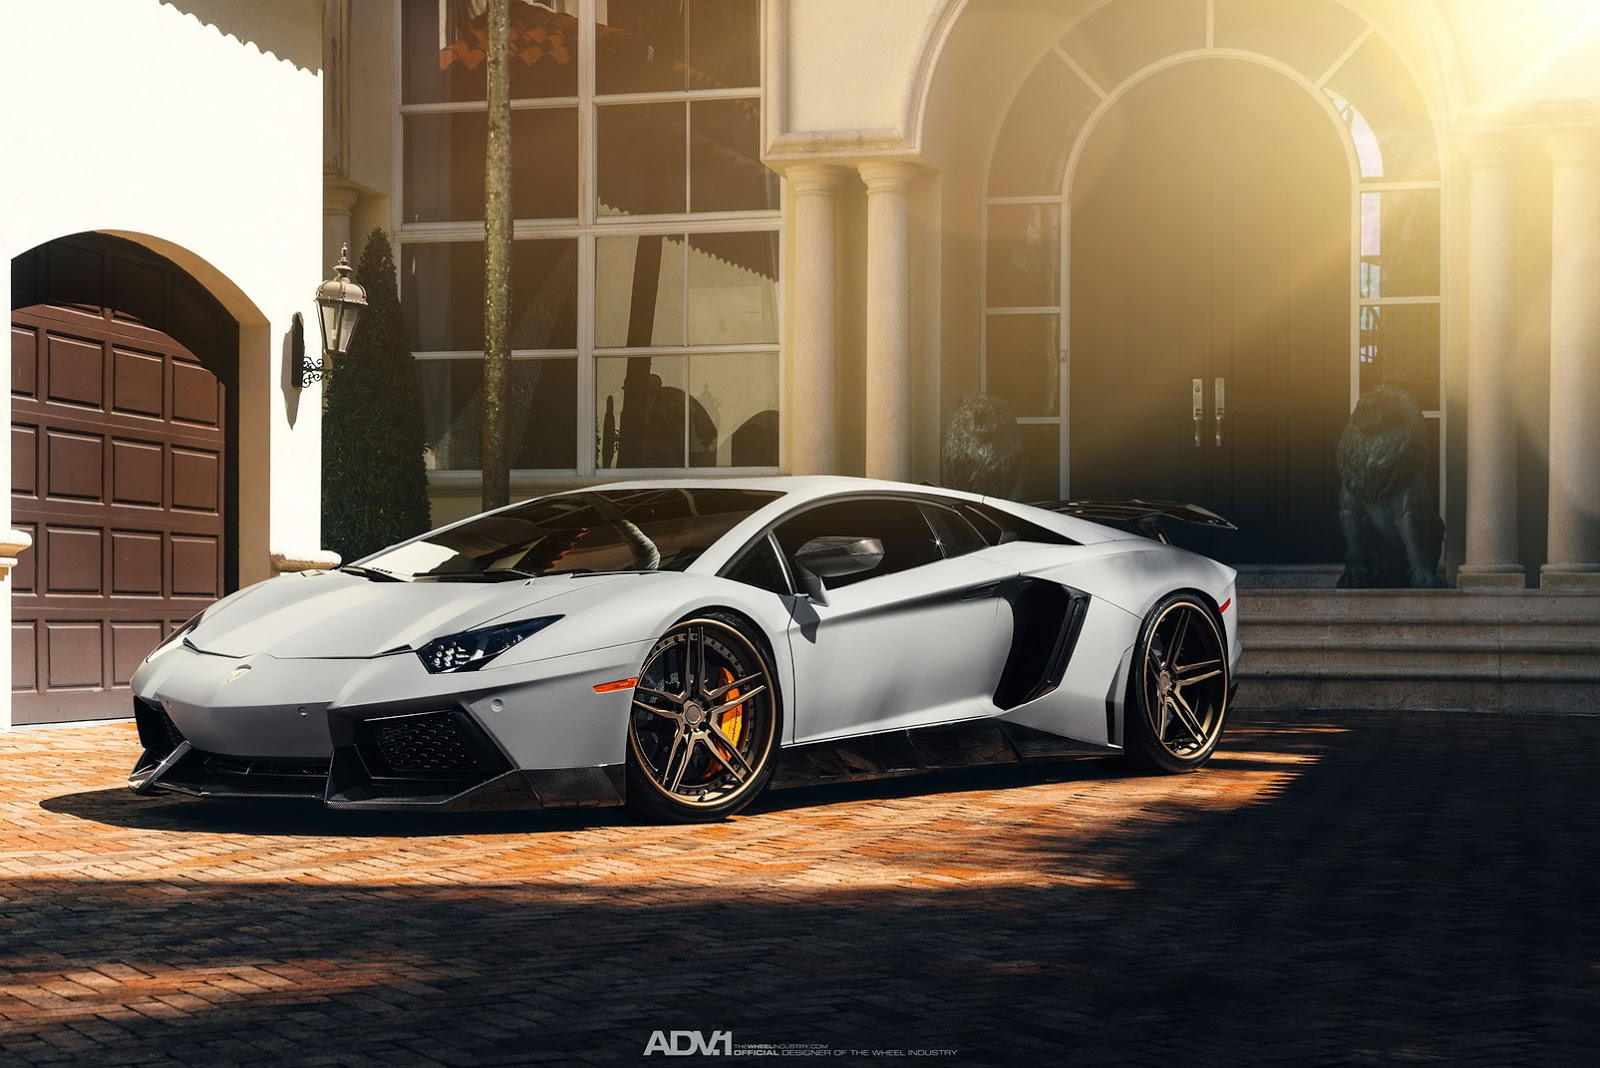 Adv1 Aventador Lamborghini Miami Wallpapers: Menudas Fotos De Un Lamborghini Aventador Con Llantas ADV1